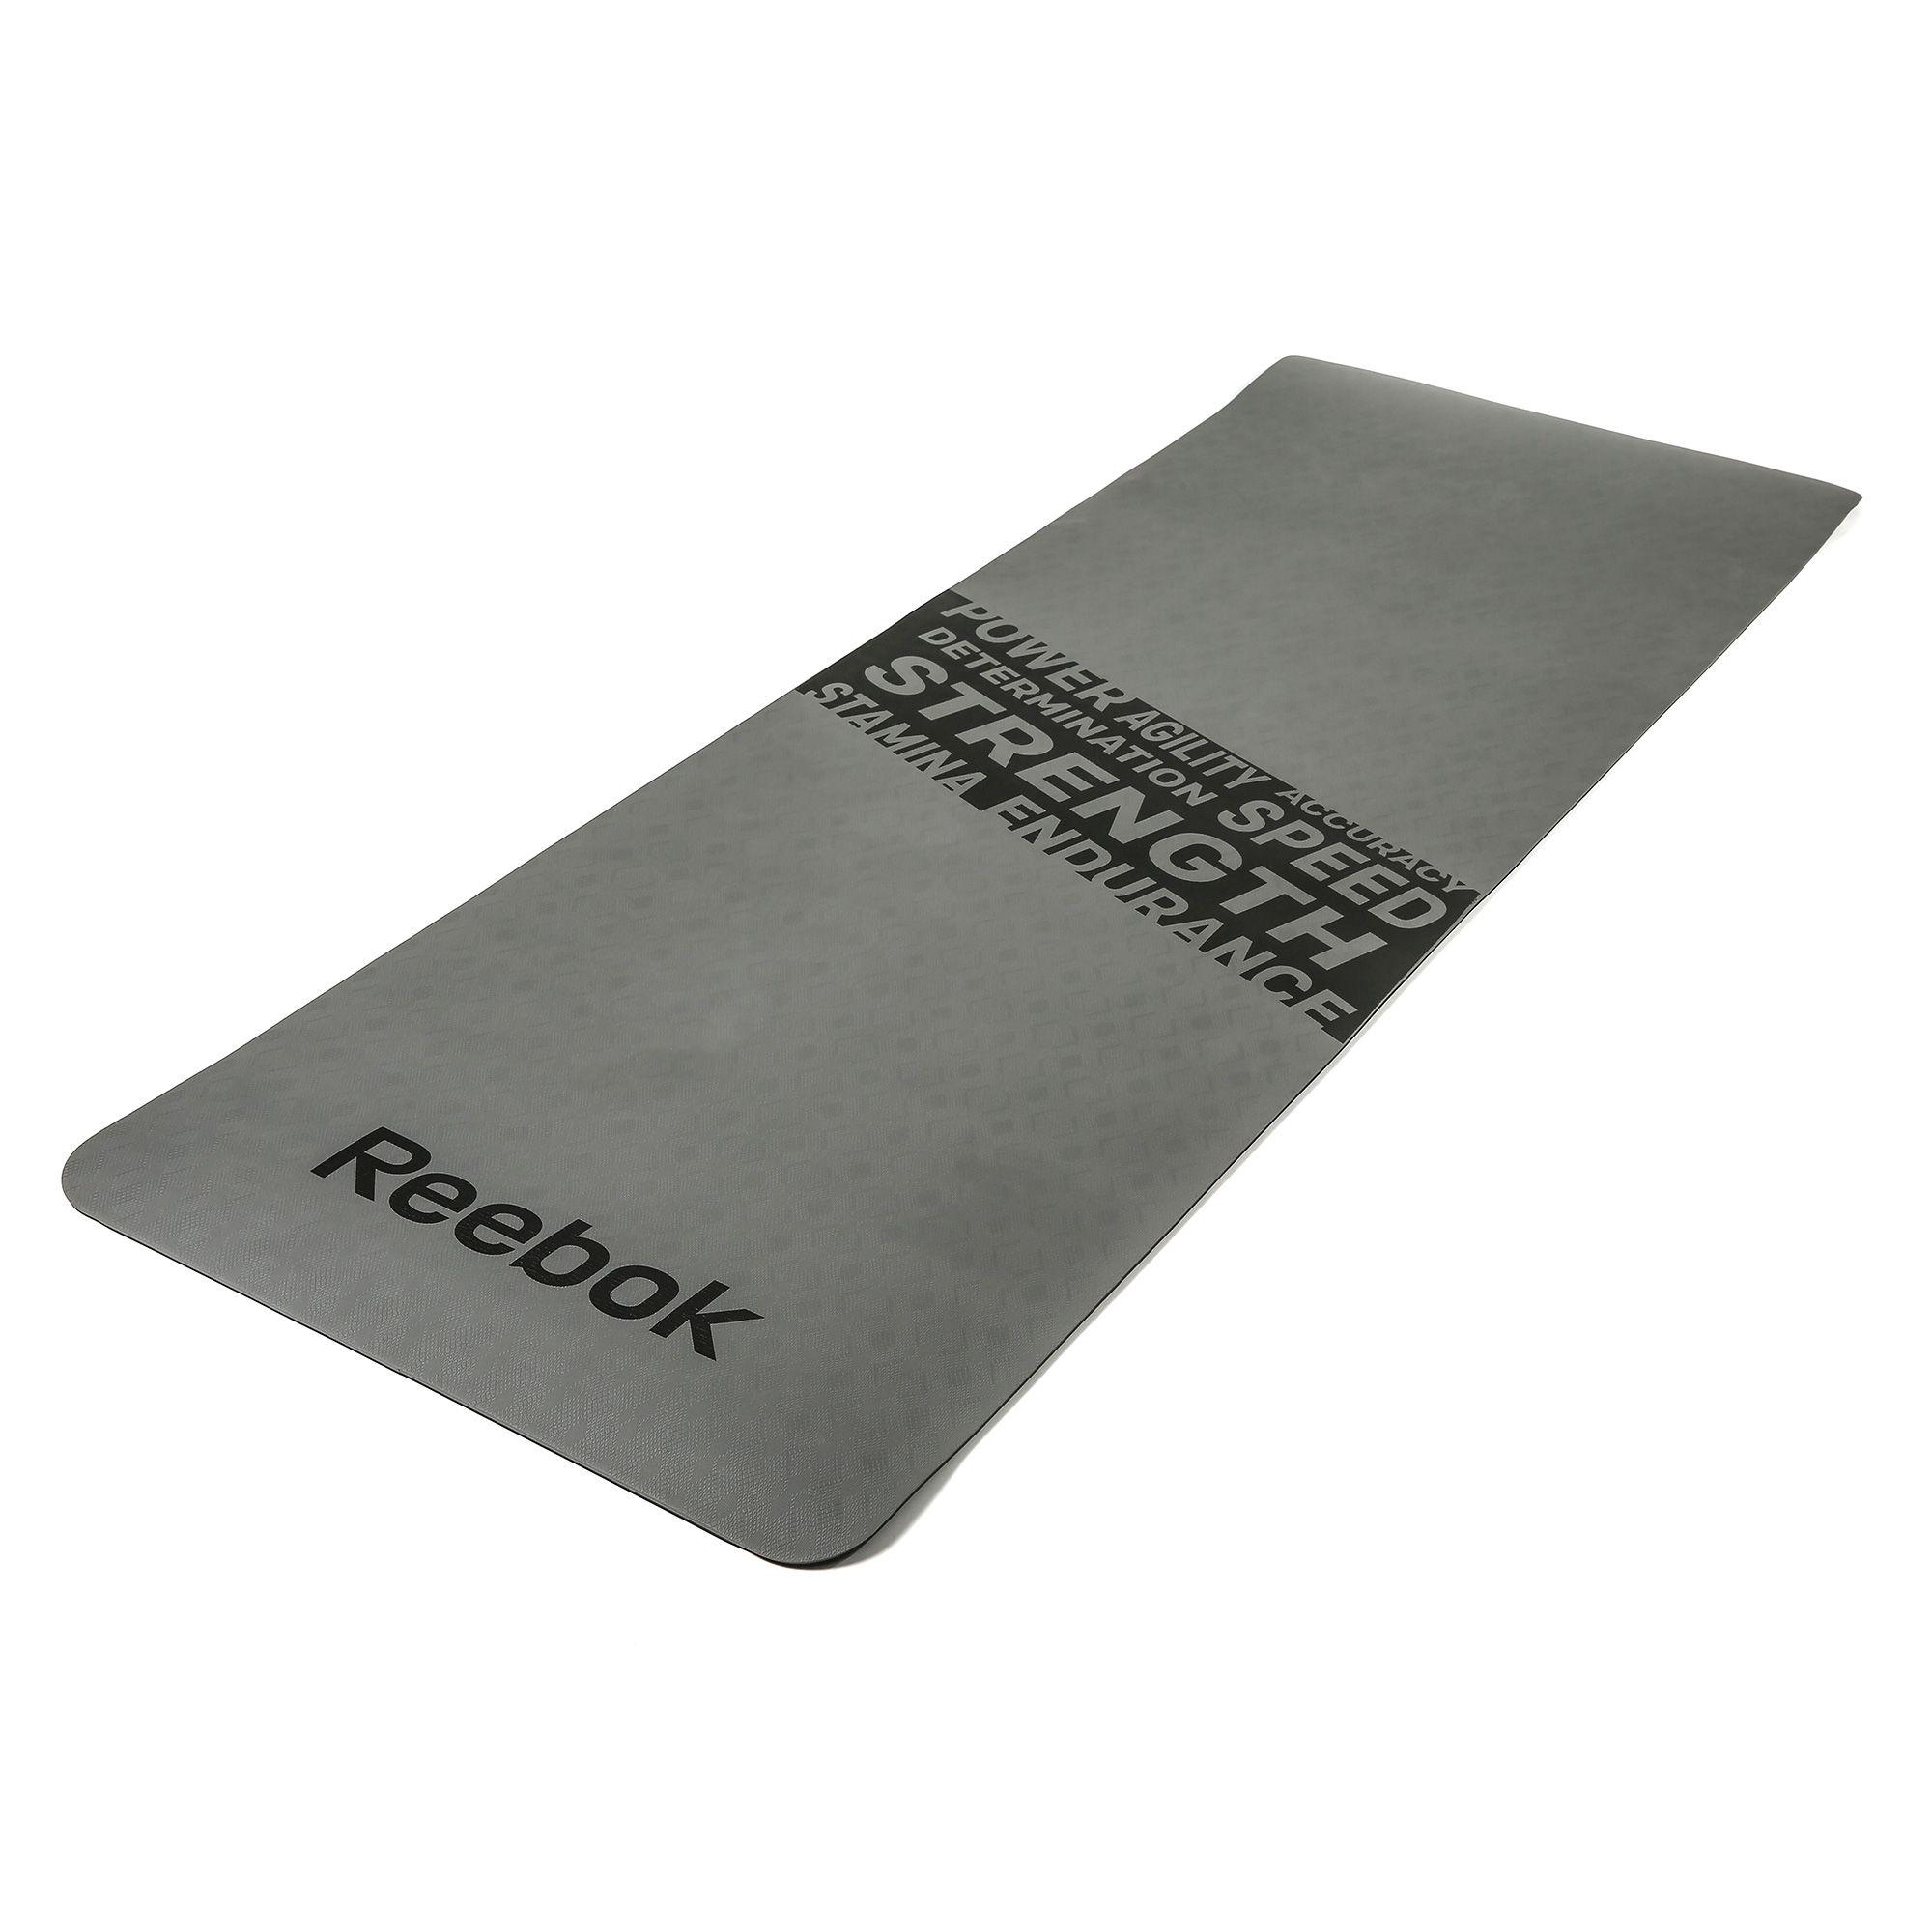 Reebok Mens Training Strength Fitness Mat